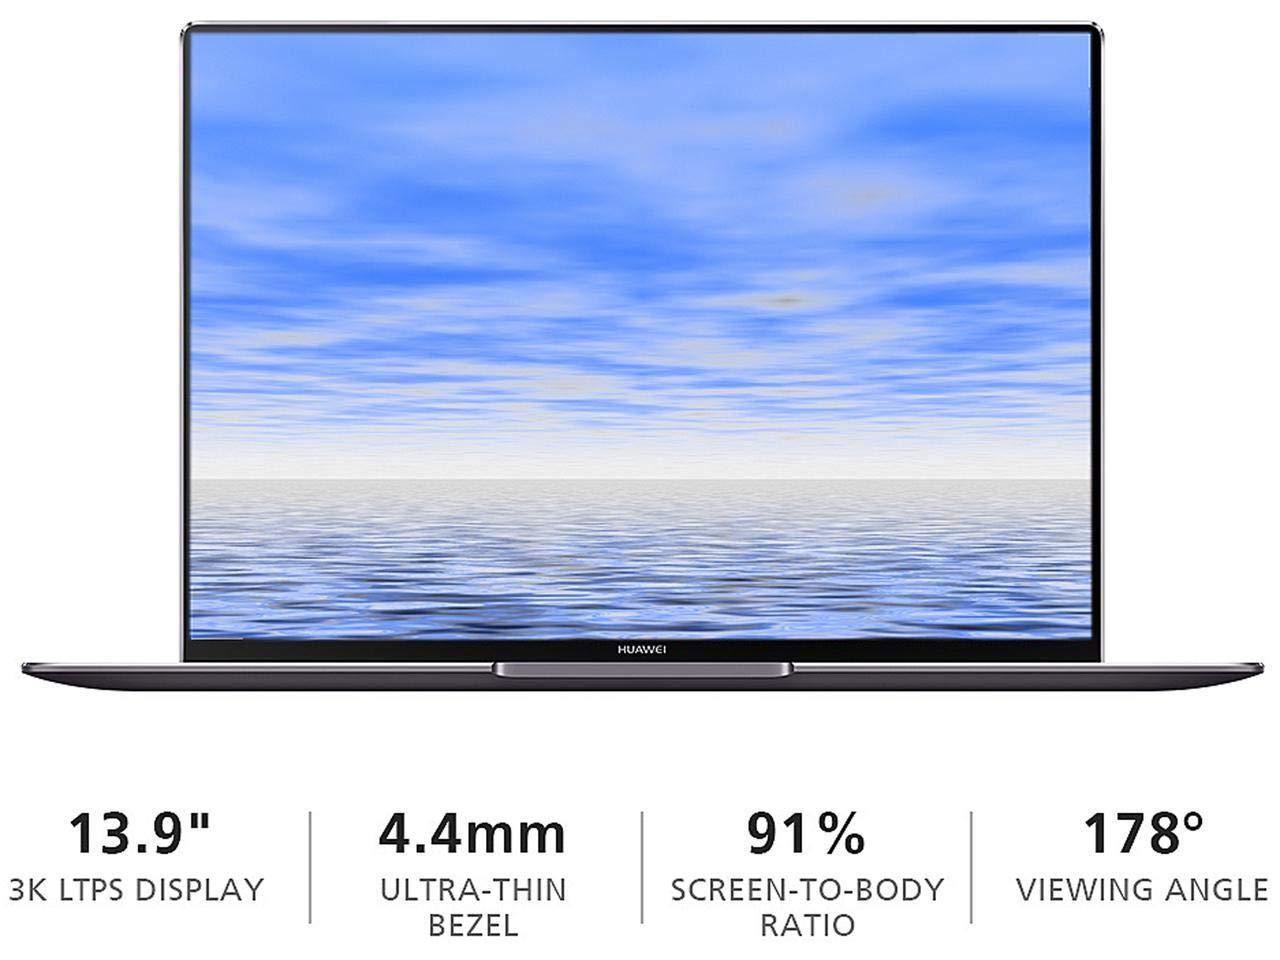 "Huawei MateBook X Pro i5 SSD 13.9"" 3K(3000x2000) Touchscreen Laptop Computer 2018 Newest, Intel Core i5 8th Gen up to 3.4 Ghz(Beat i7-7500U), 8 GB DDR4, 256 GB SSD, WiFi, Bluetooth, Windows 10"